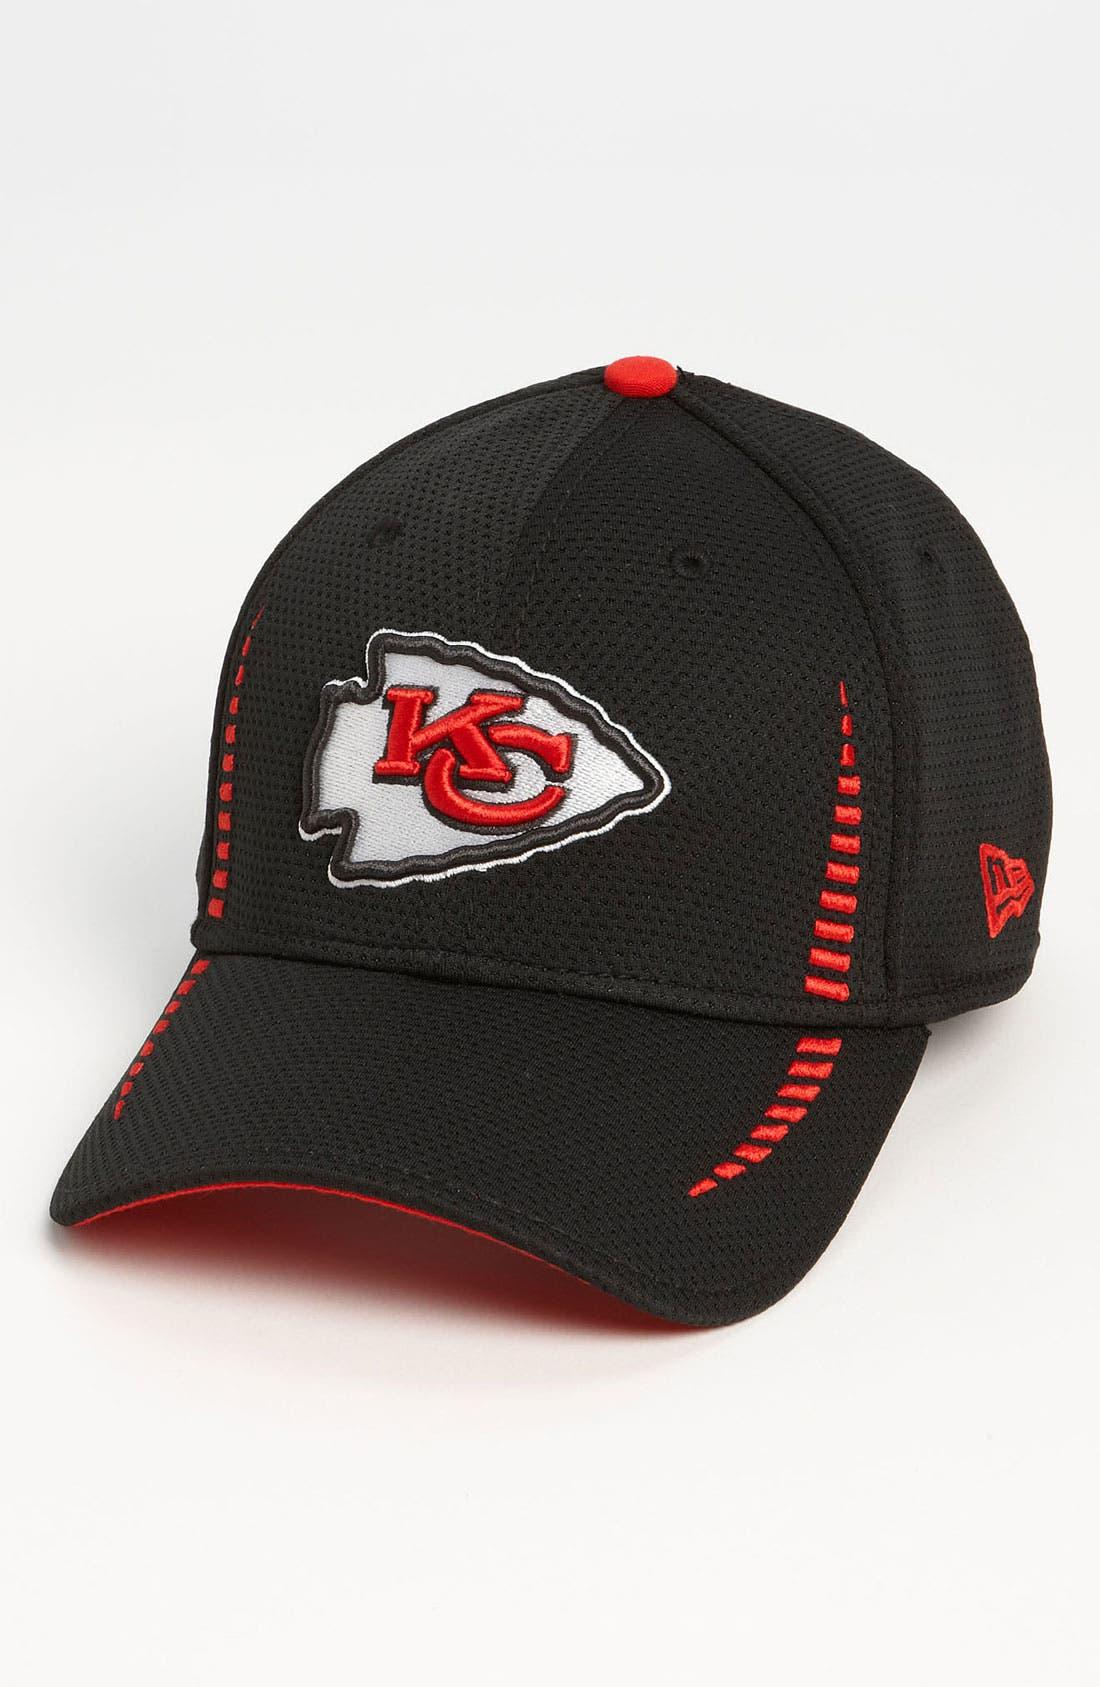 Alternate Image 1 Selected - New Era Cap 'Training Camp - Kansas City Chiefs' Baseball Cap